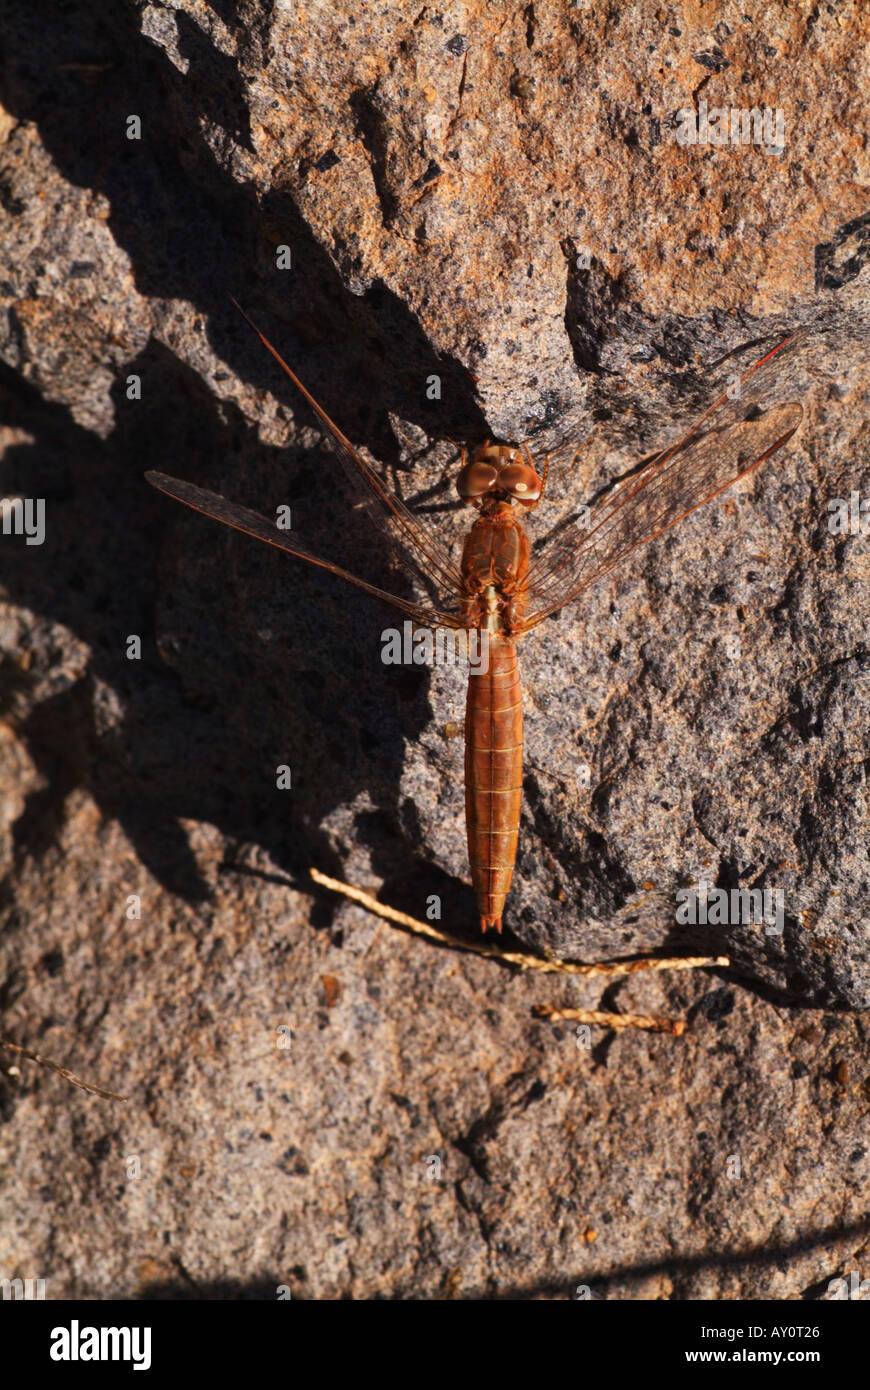 Scarlet Darter (Crocothemis erythraea) resting on rock. Stock Photo